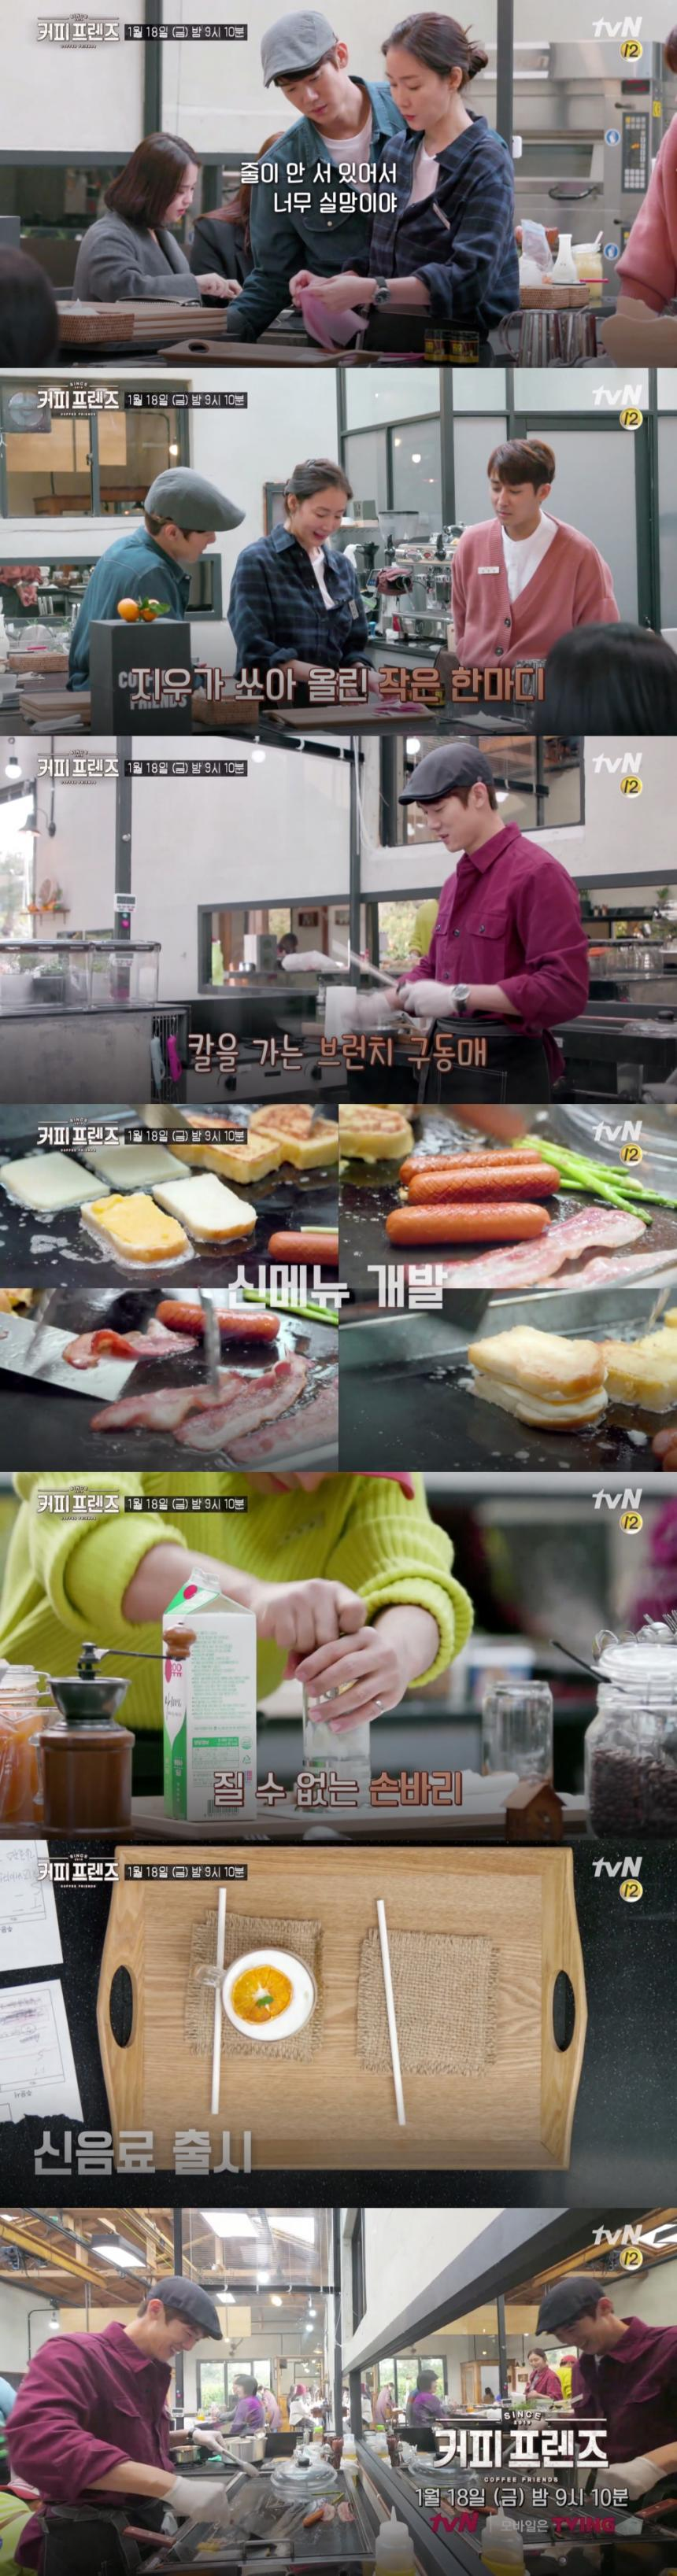 tvN '커피프렌즈' 방송 캡처